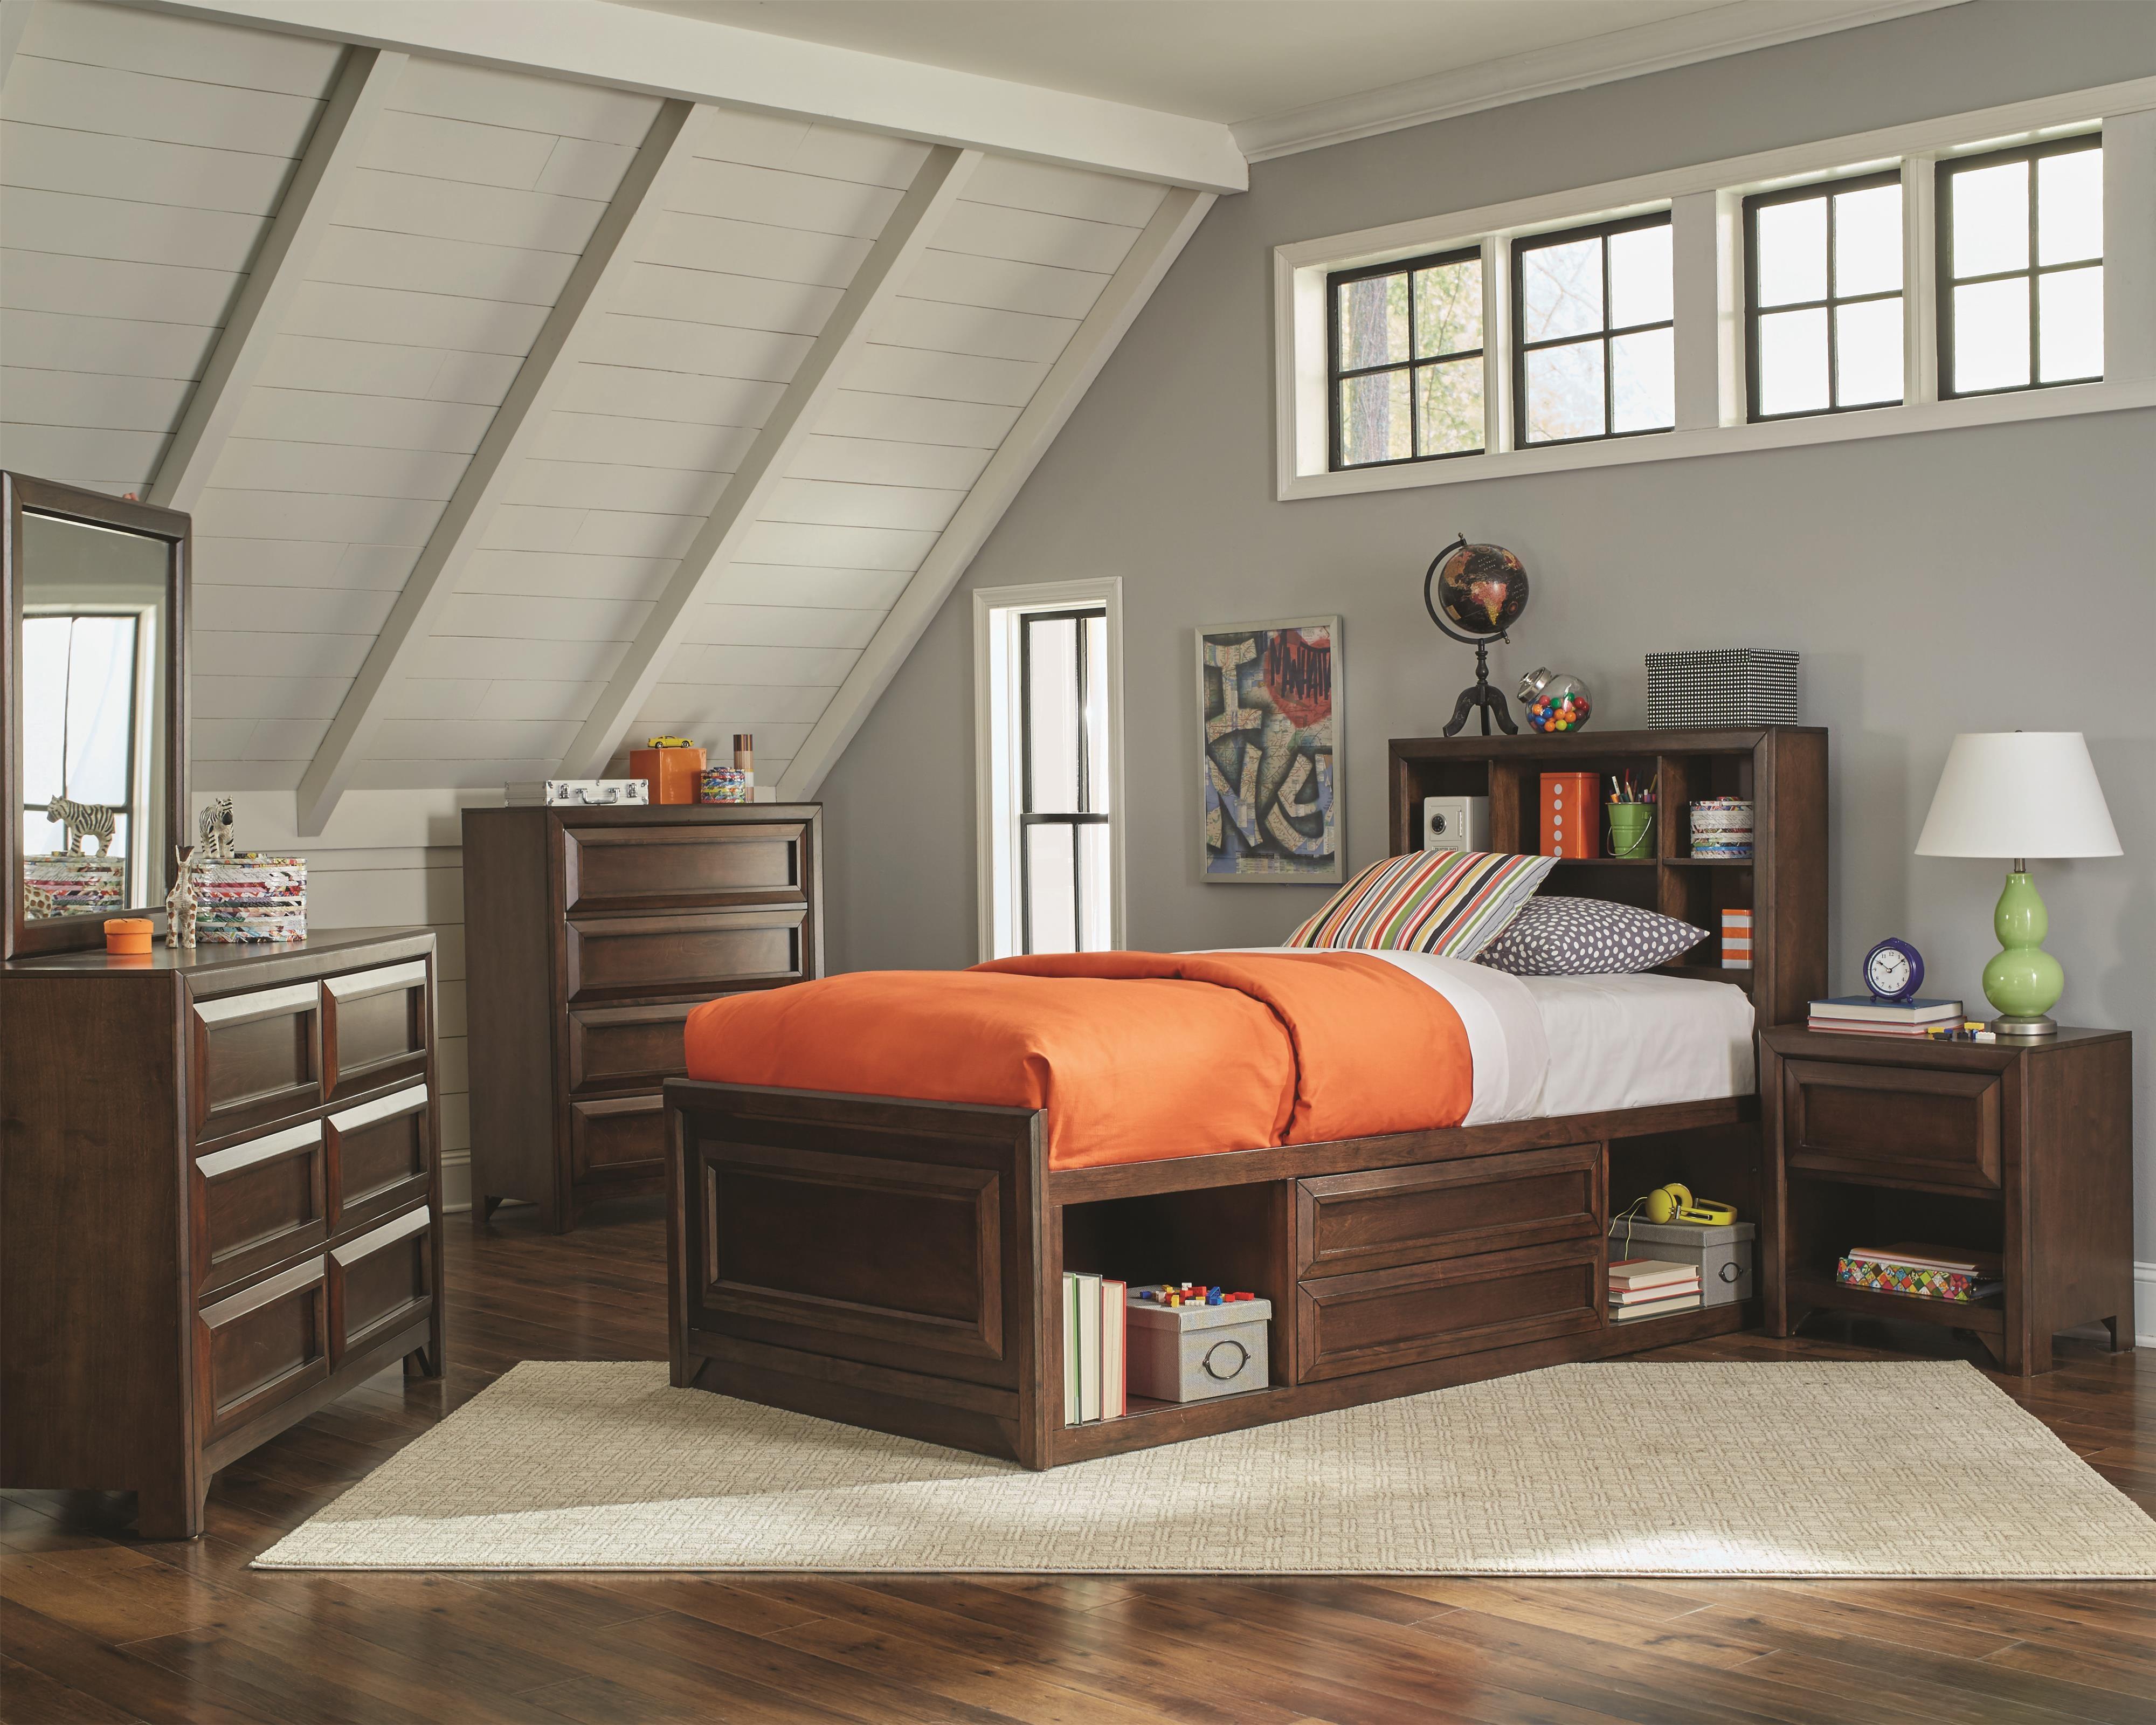 Bedroom Furniture With Storage Bedroom Gallery. Suitable Ideas Bed ...